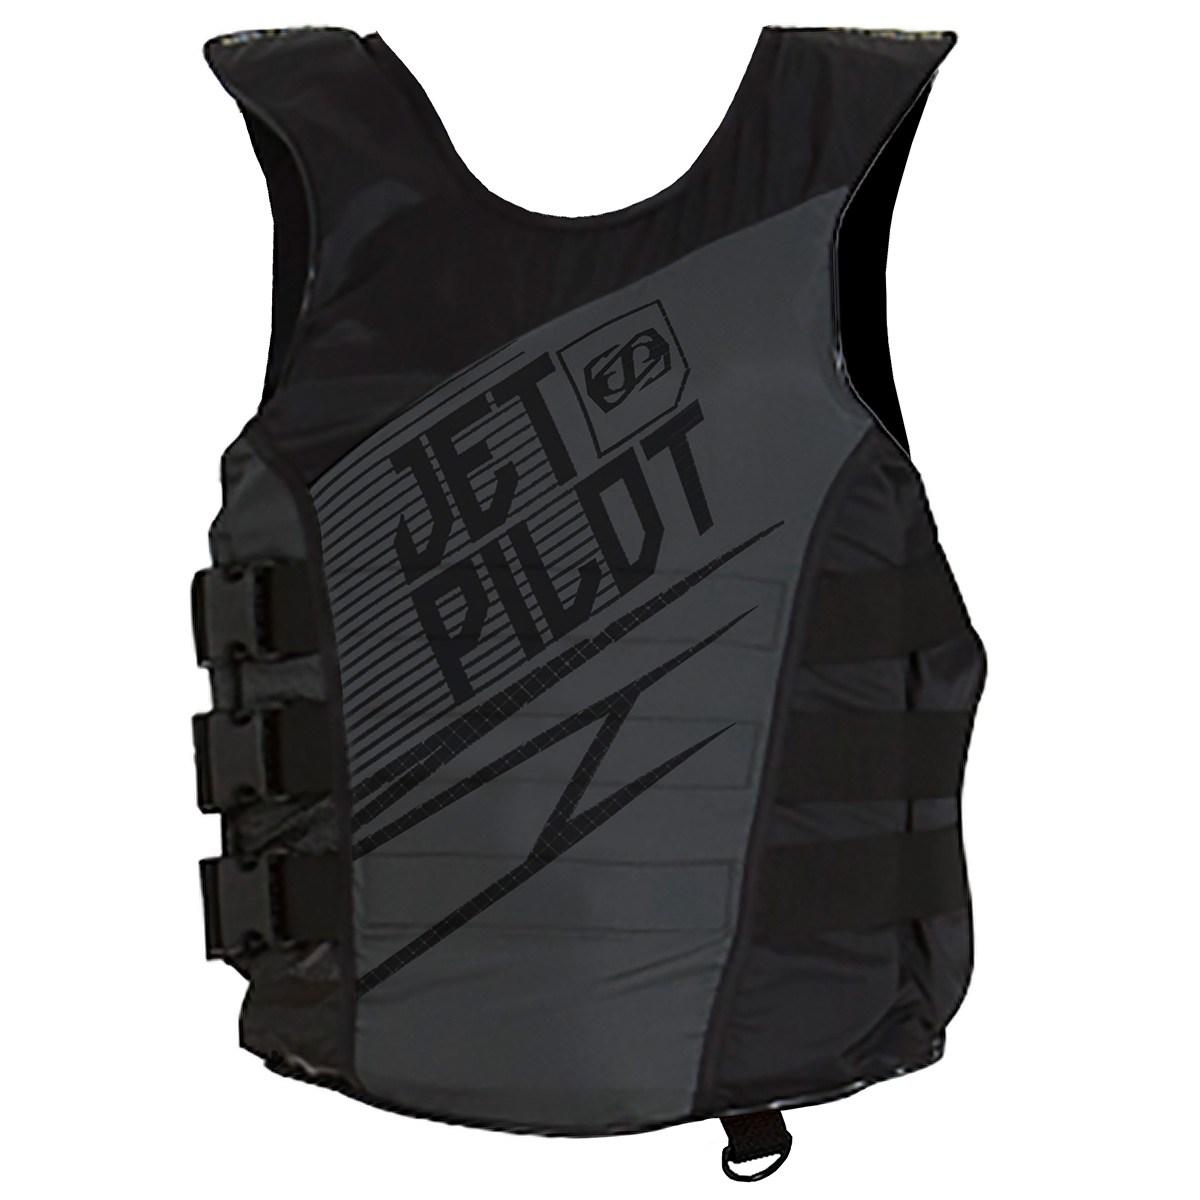 Jetpilot Men S Matrix Nylon Side Entry Pfd Life Vest